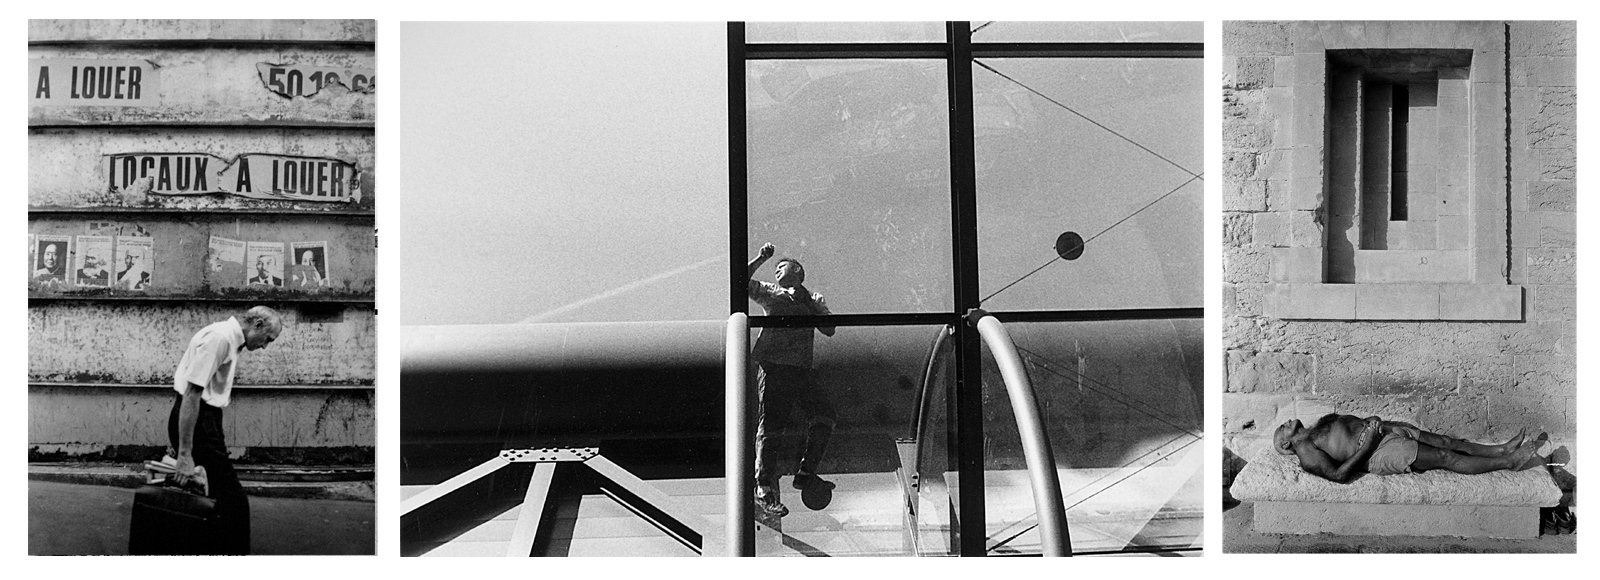 Art and Documentary Photography - Loading 025_Marseille___Fabio_Sgroi.jpg